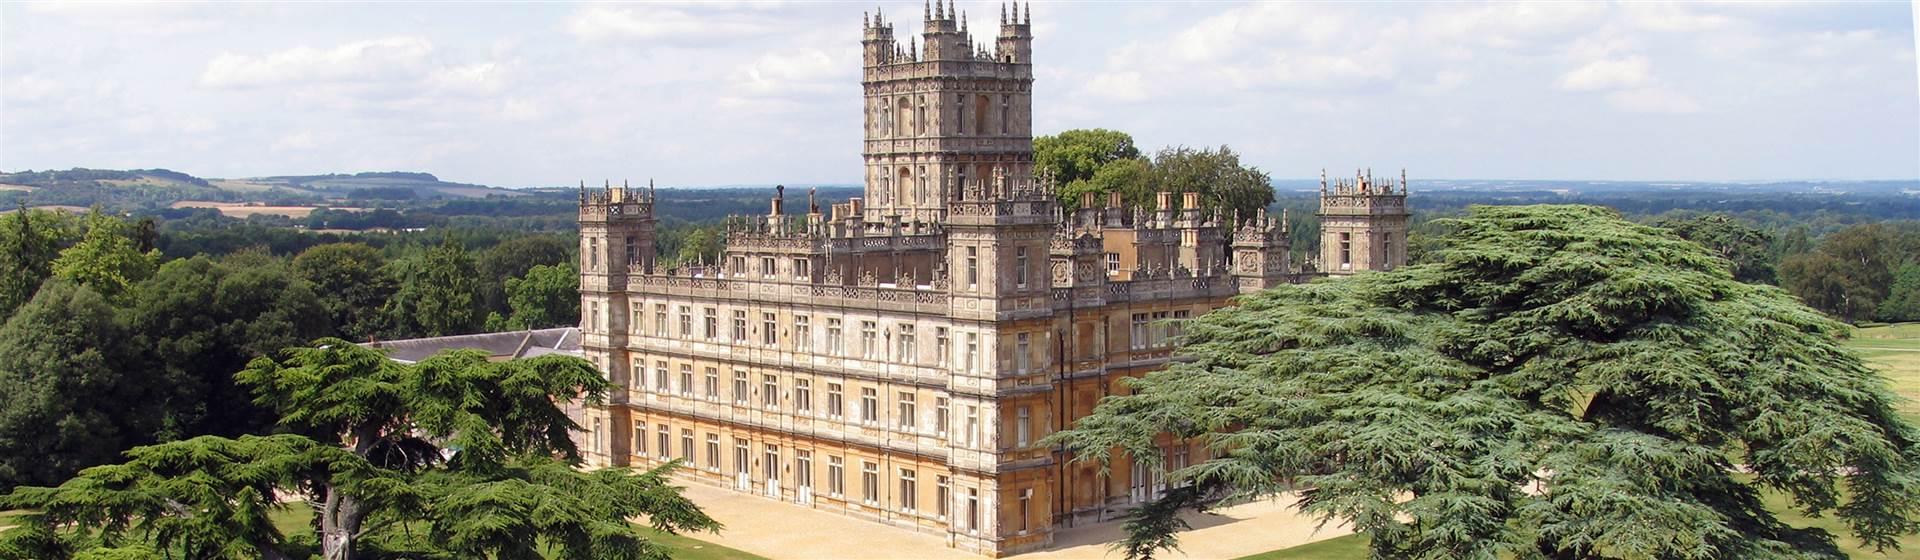 Downton Abbey, Oxford & Windsor